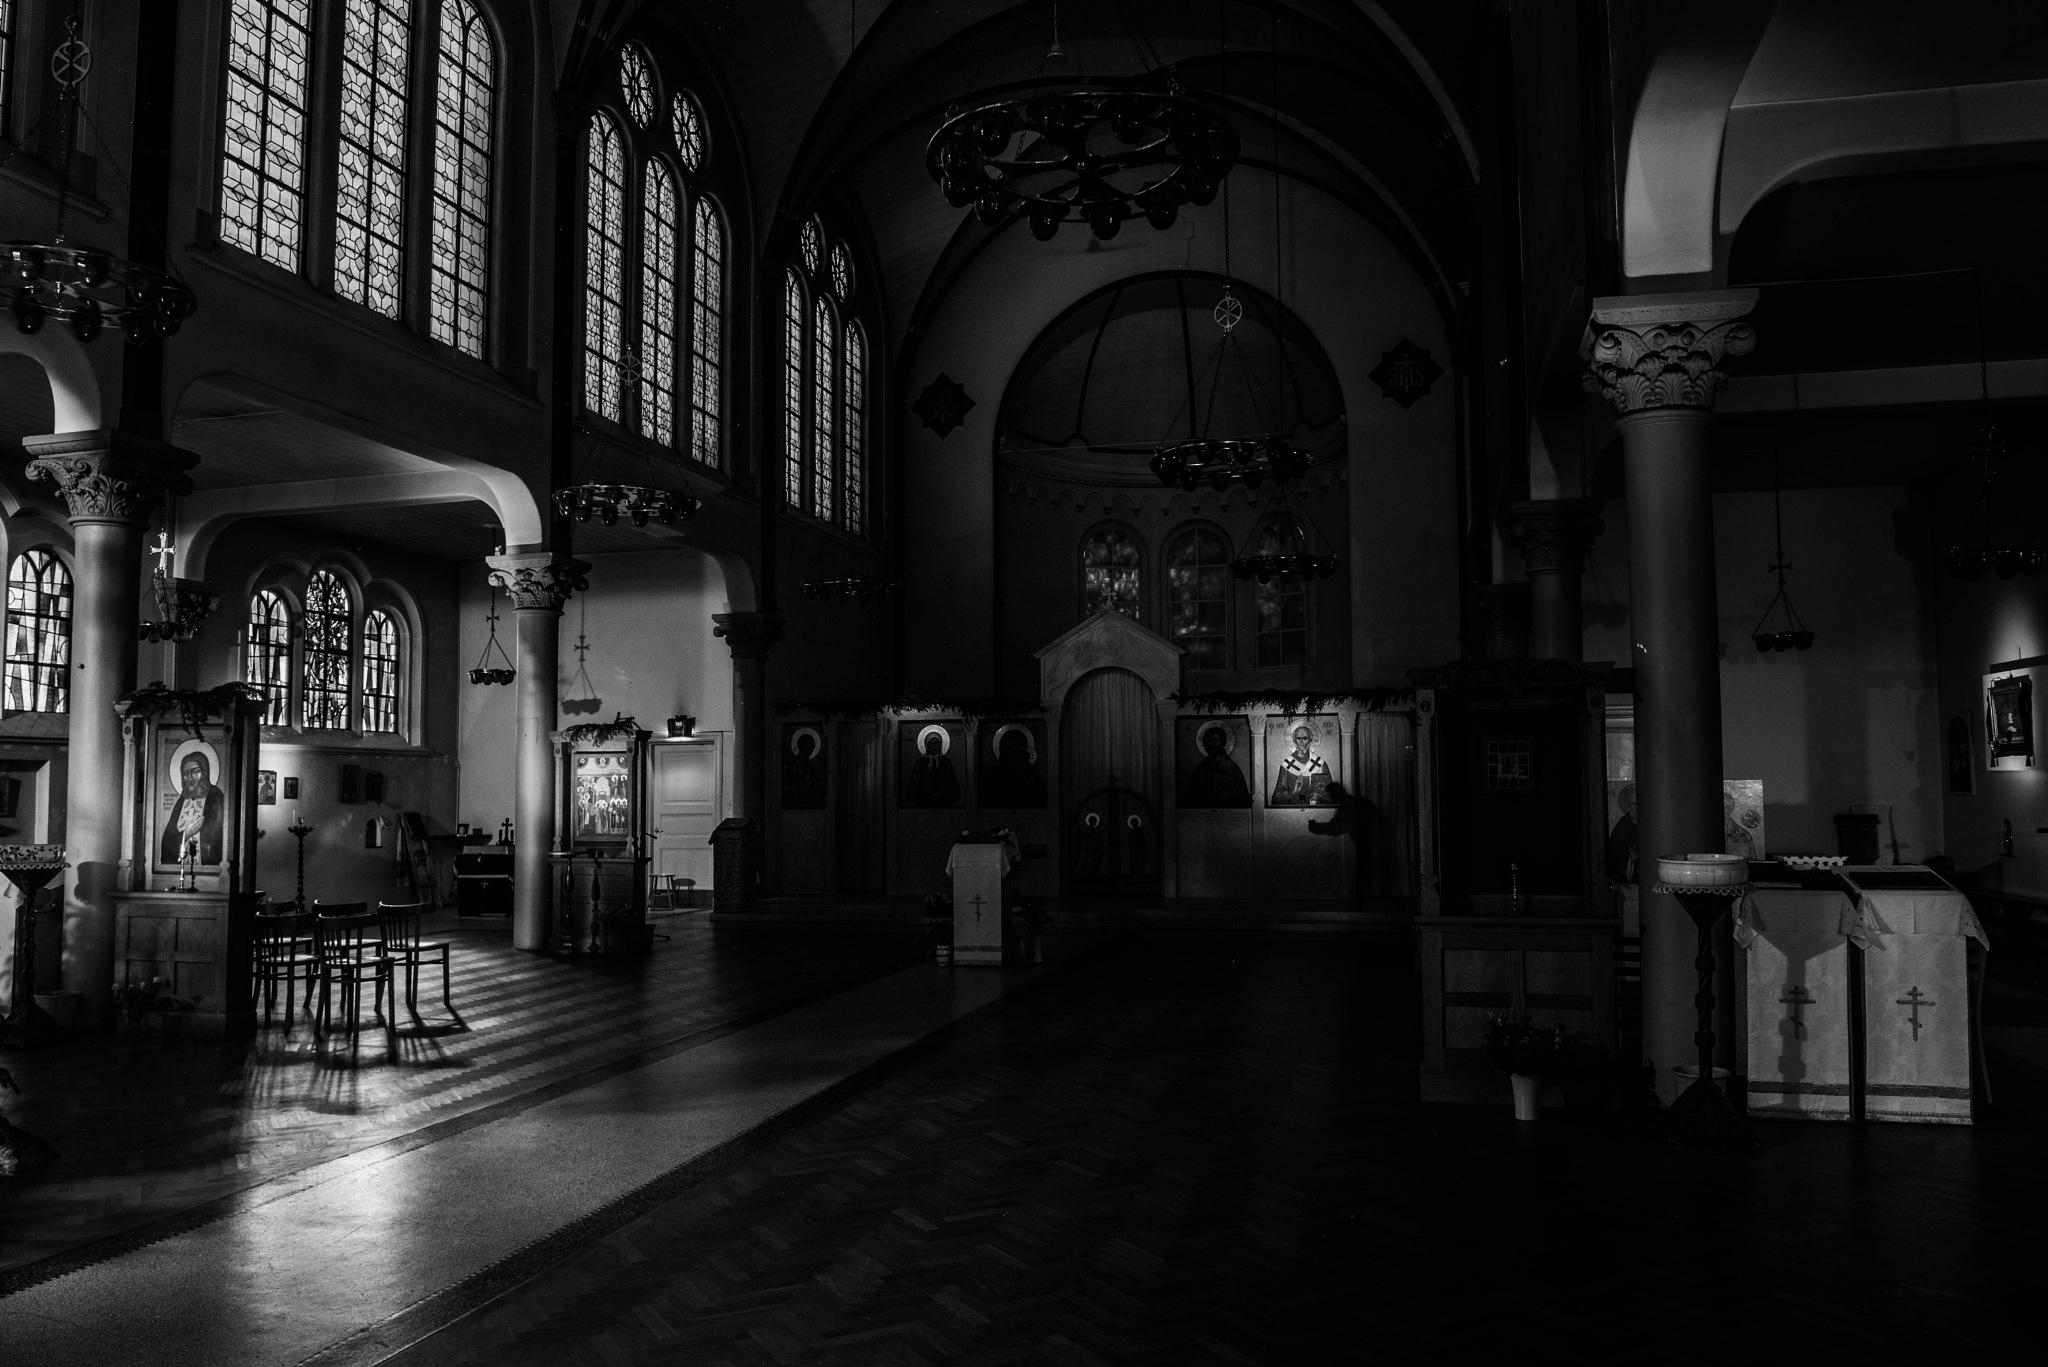 Photo in Black and White #bnwstreetphotography #bnwstreet #nikon #zwartwitfotografie #zwartwit #monochrome #storytellingpictures #apad #art #church #blackandwhitephotography #urbanphotography #amsterdam